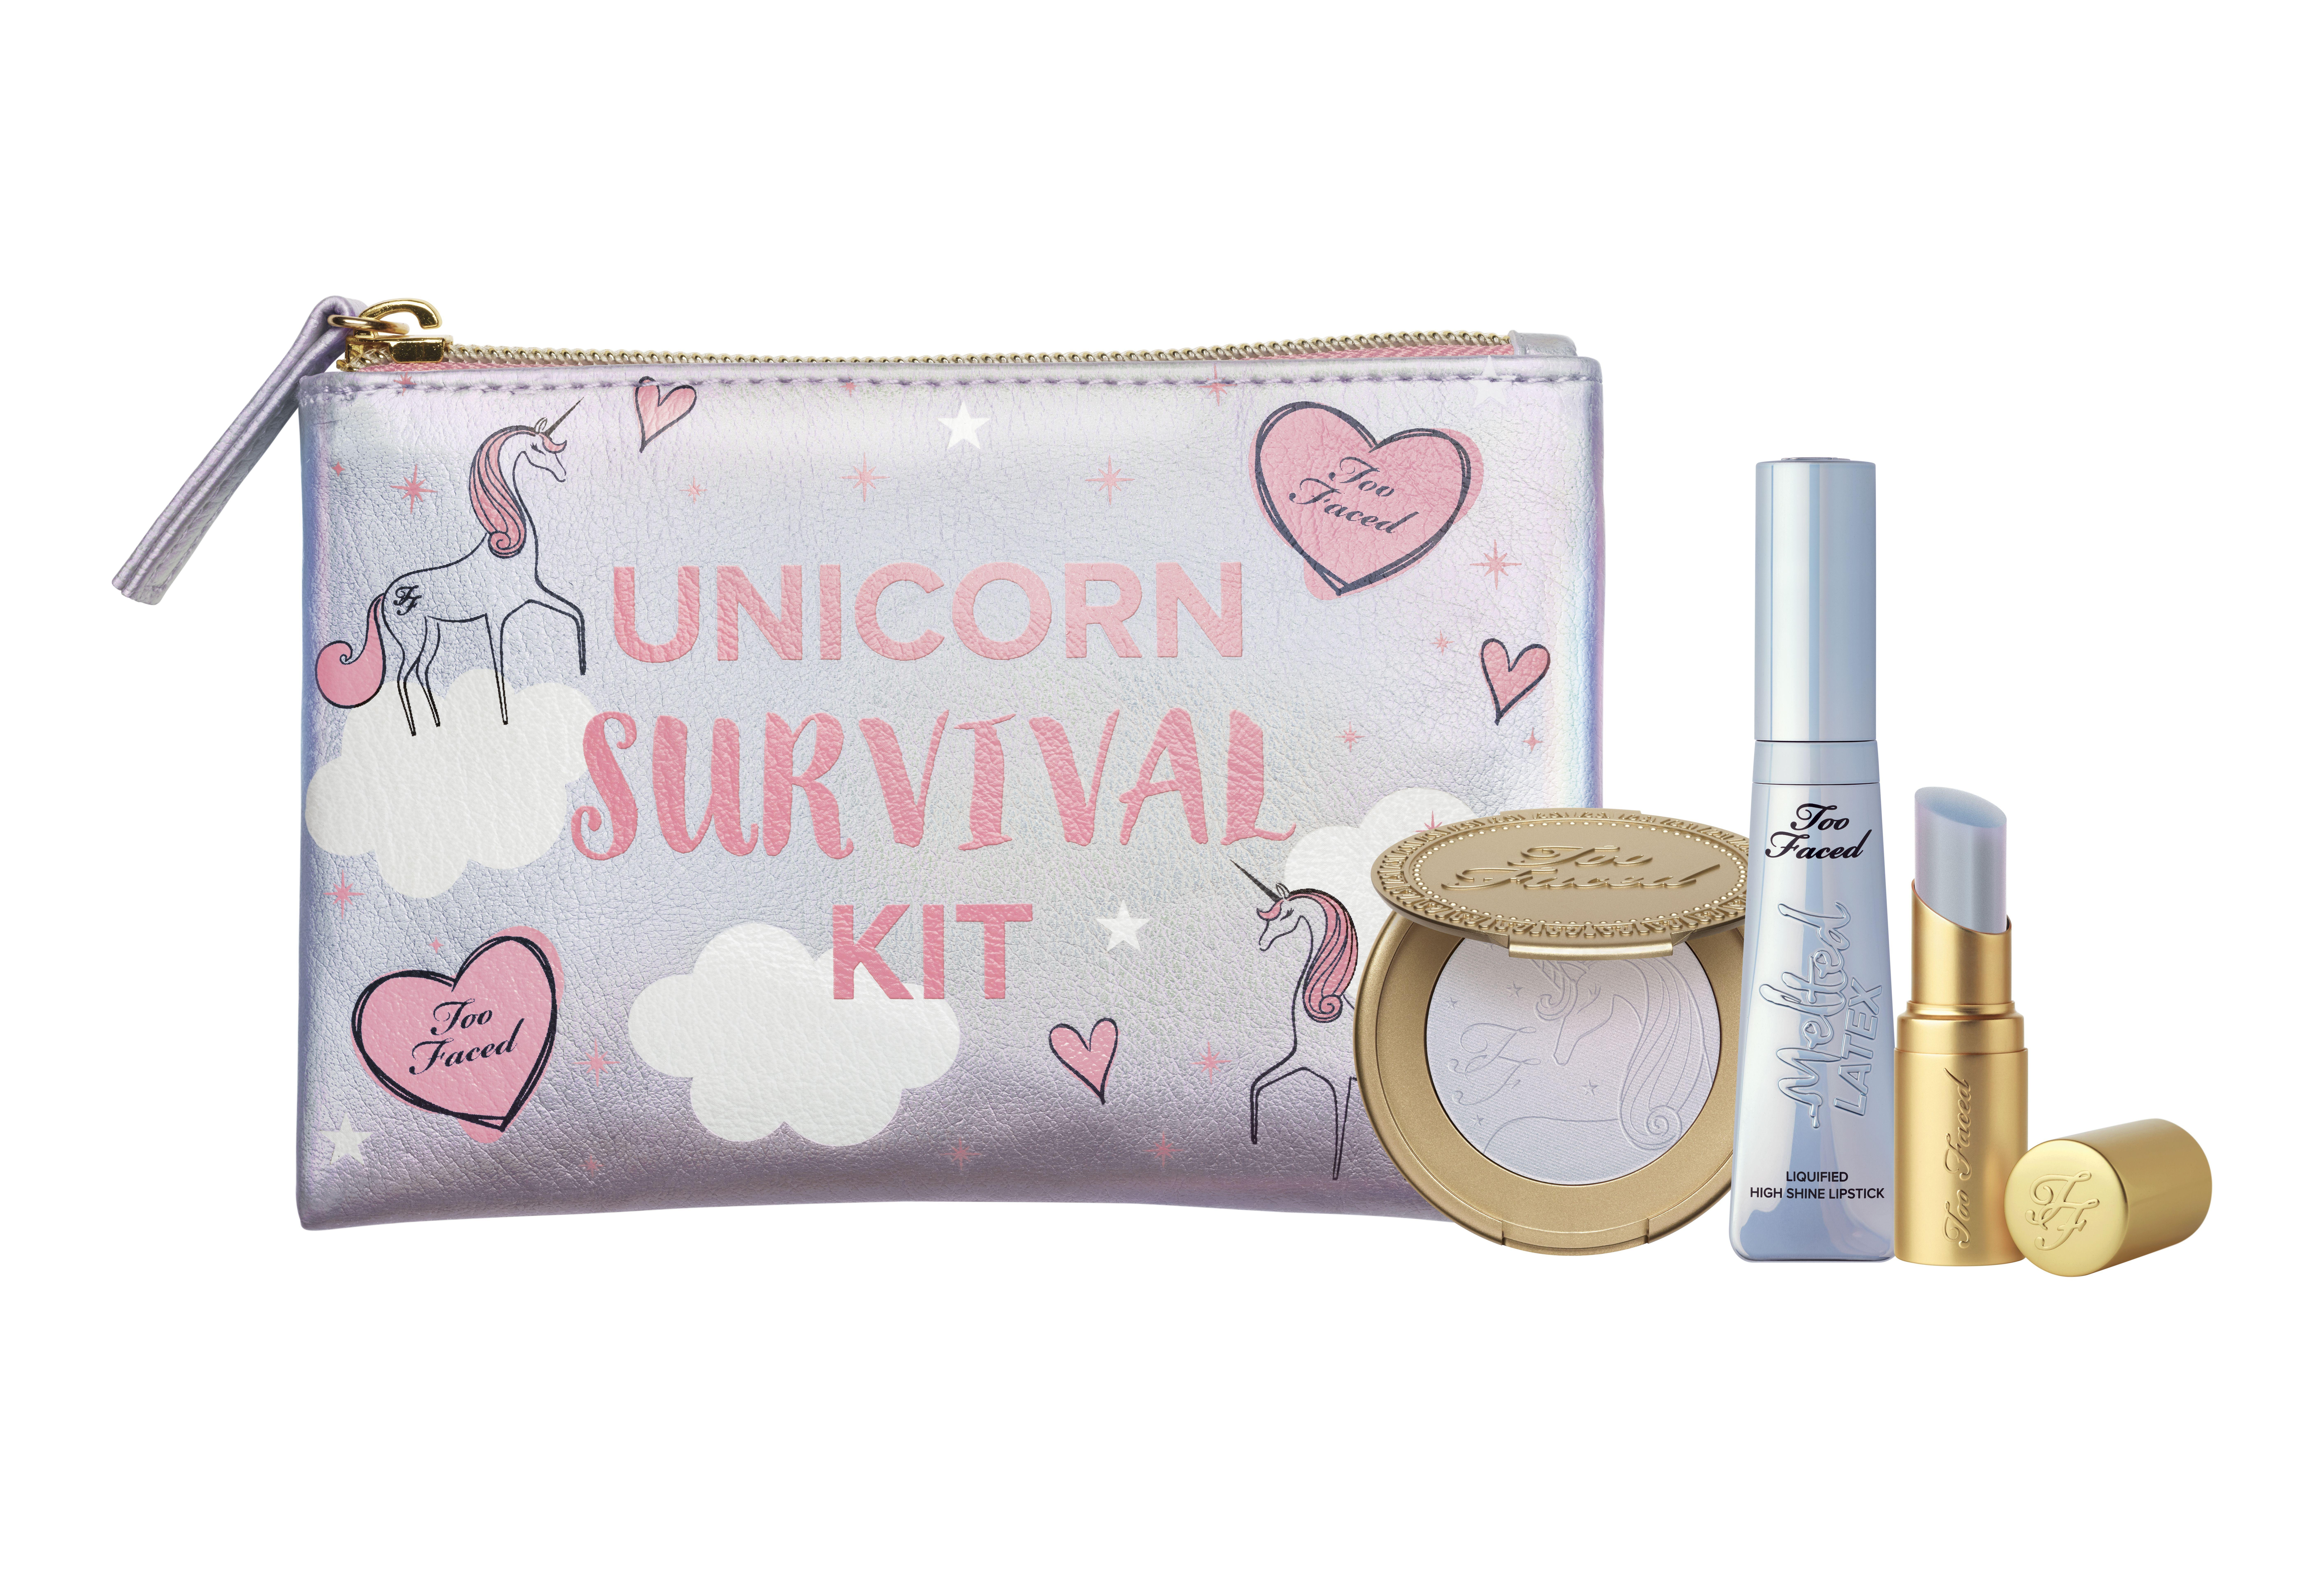 Makeup Sets Kits & Gift Sets Unicorn makeup, Survival